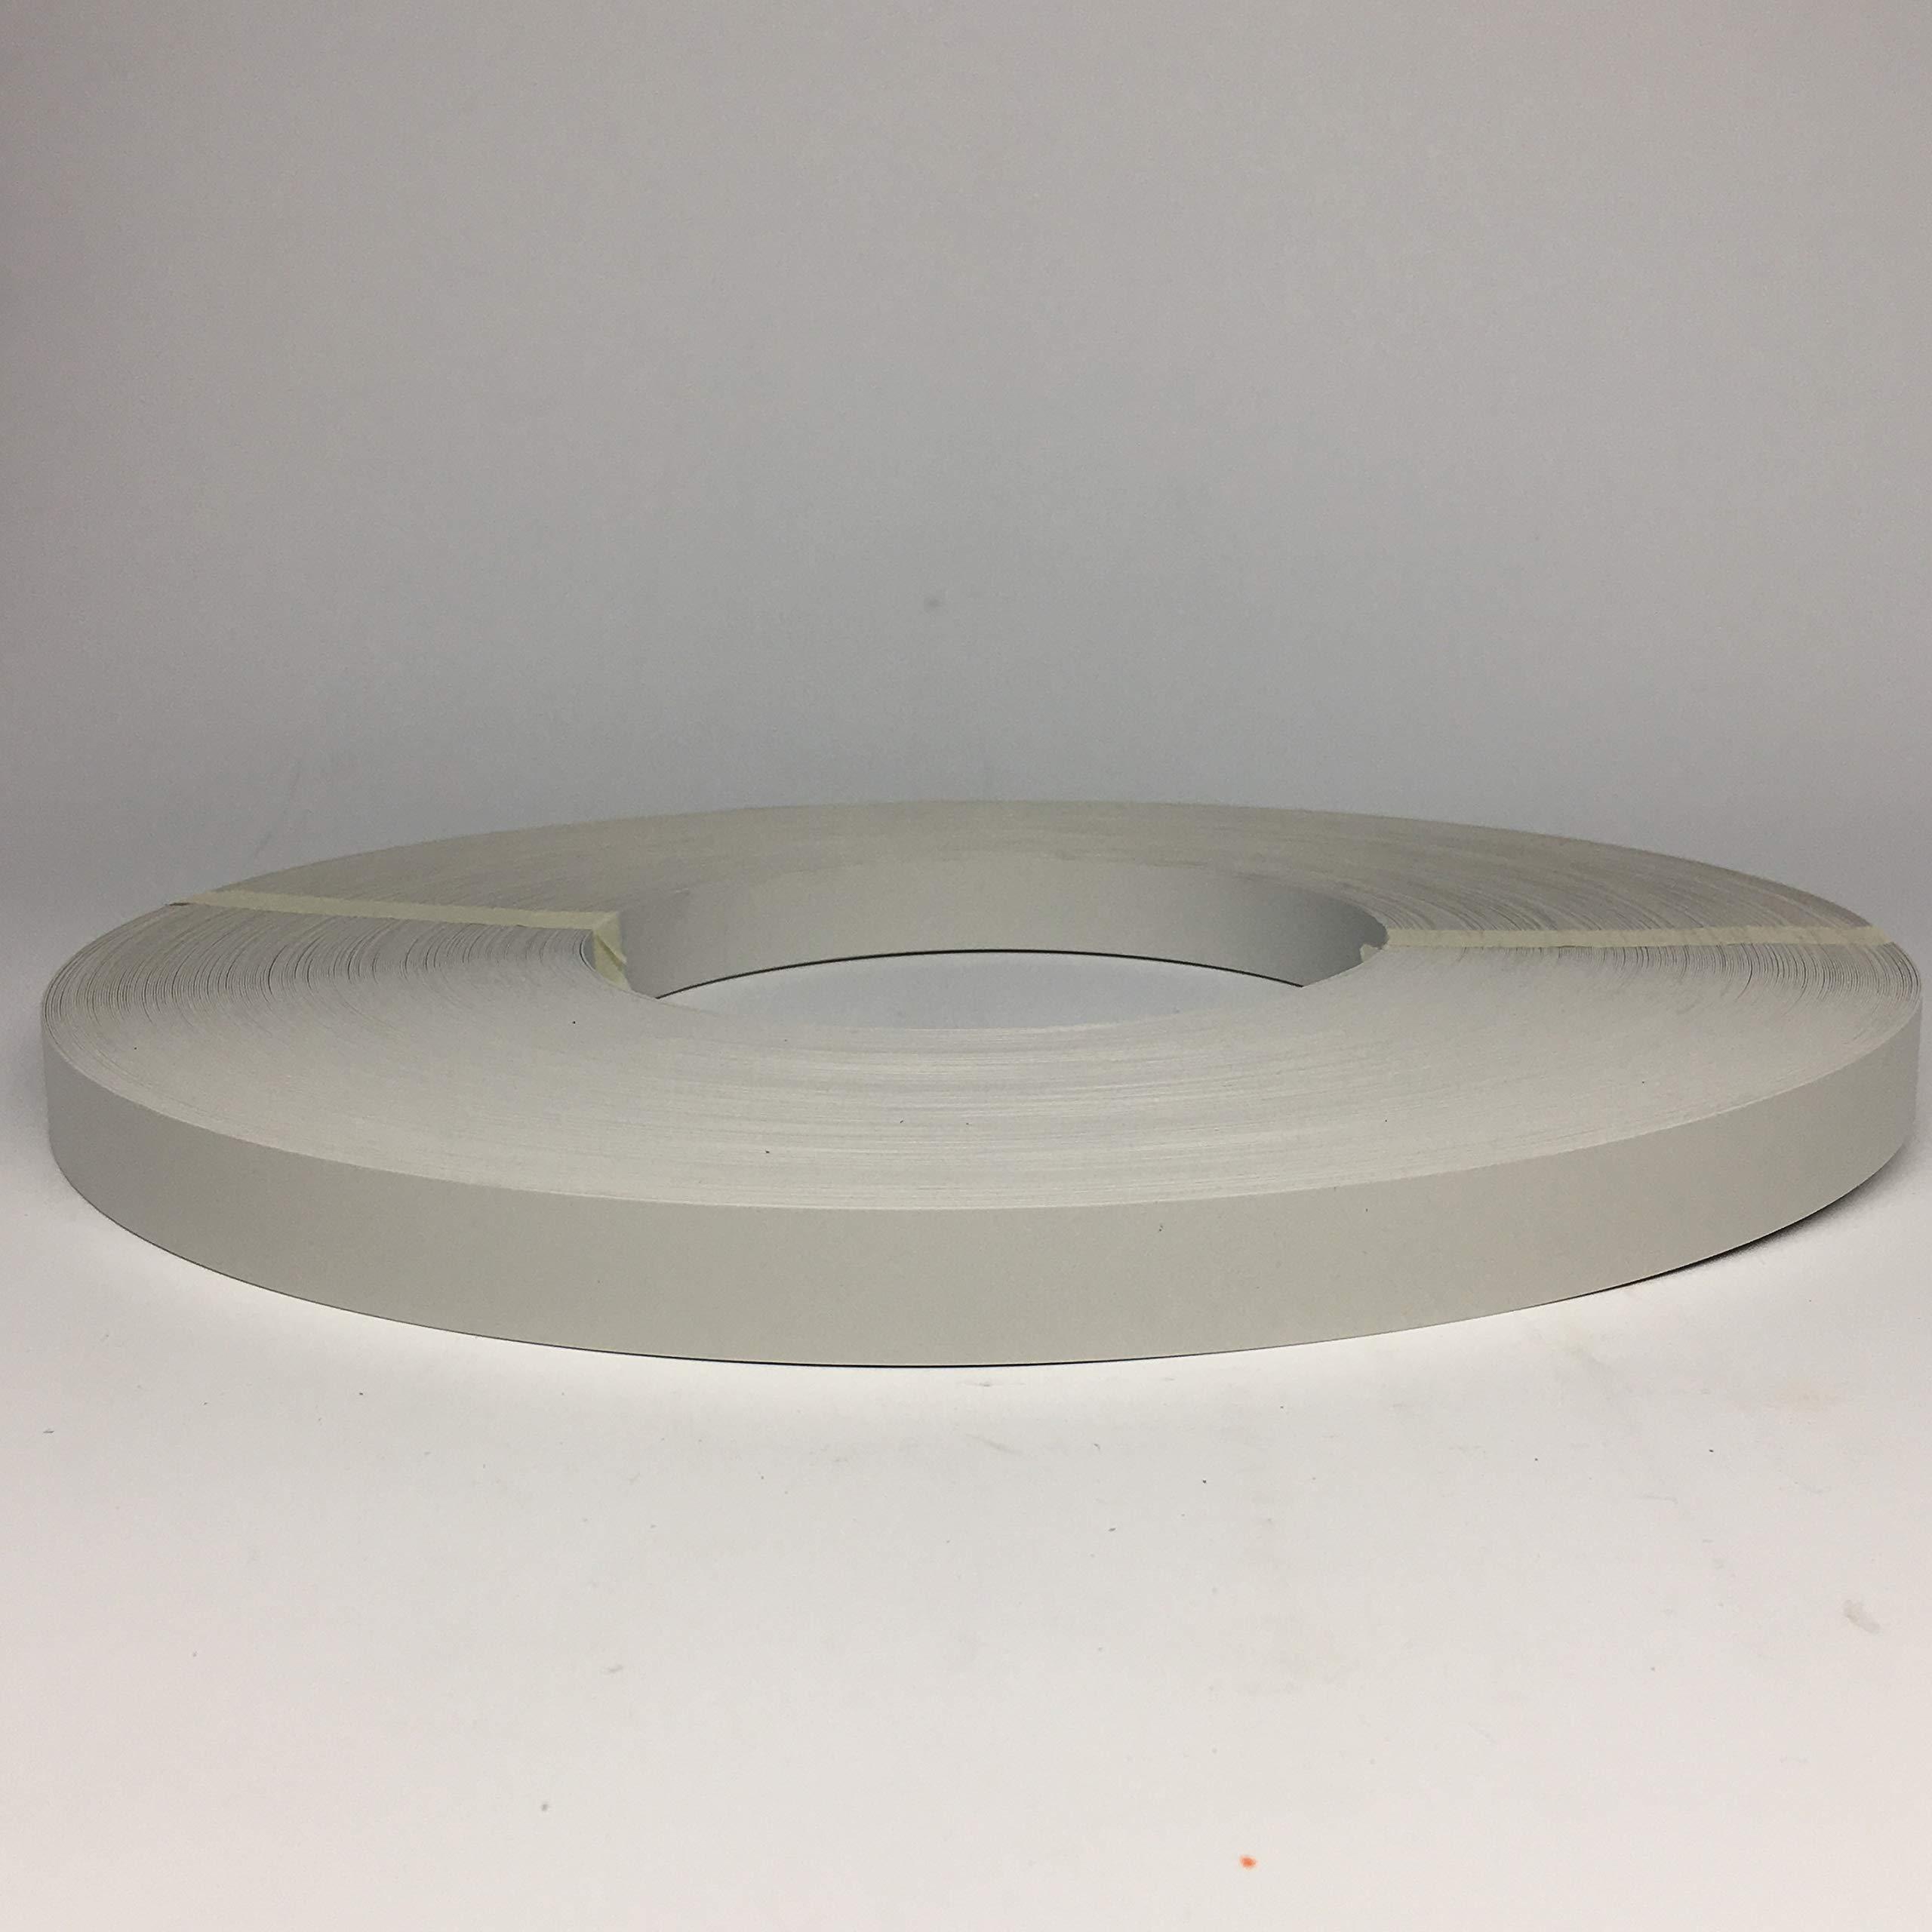 PVC Non GLUED Automatic EDGEBANDING, 15/16'' x 600 LF/Roll, (.018'' Thick) (Folkstone) by Canplast